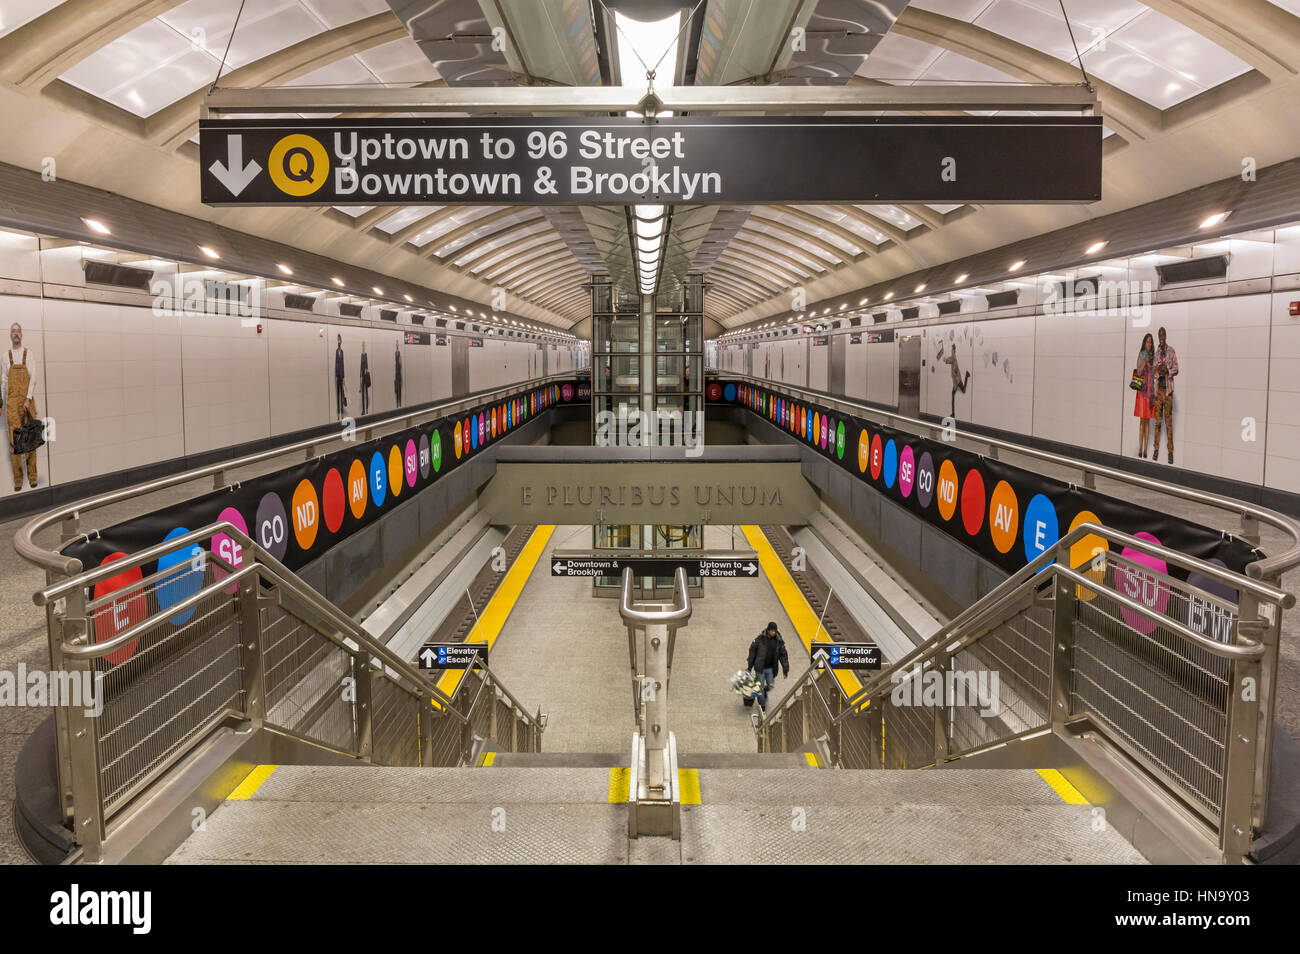 72nd Street Subway Map.Second Avenue Subway Stock Photos Second Avenue Subway Stock